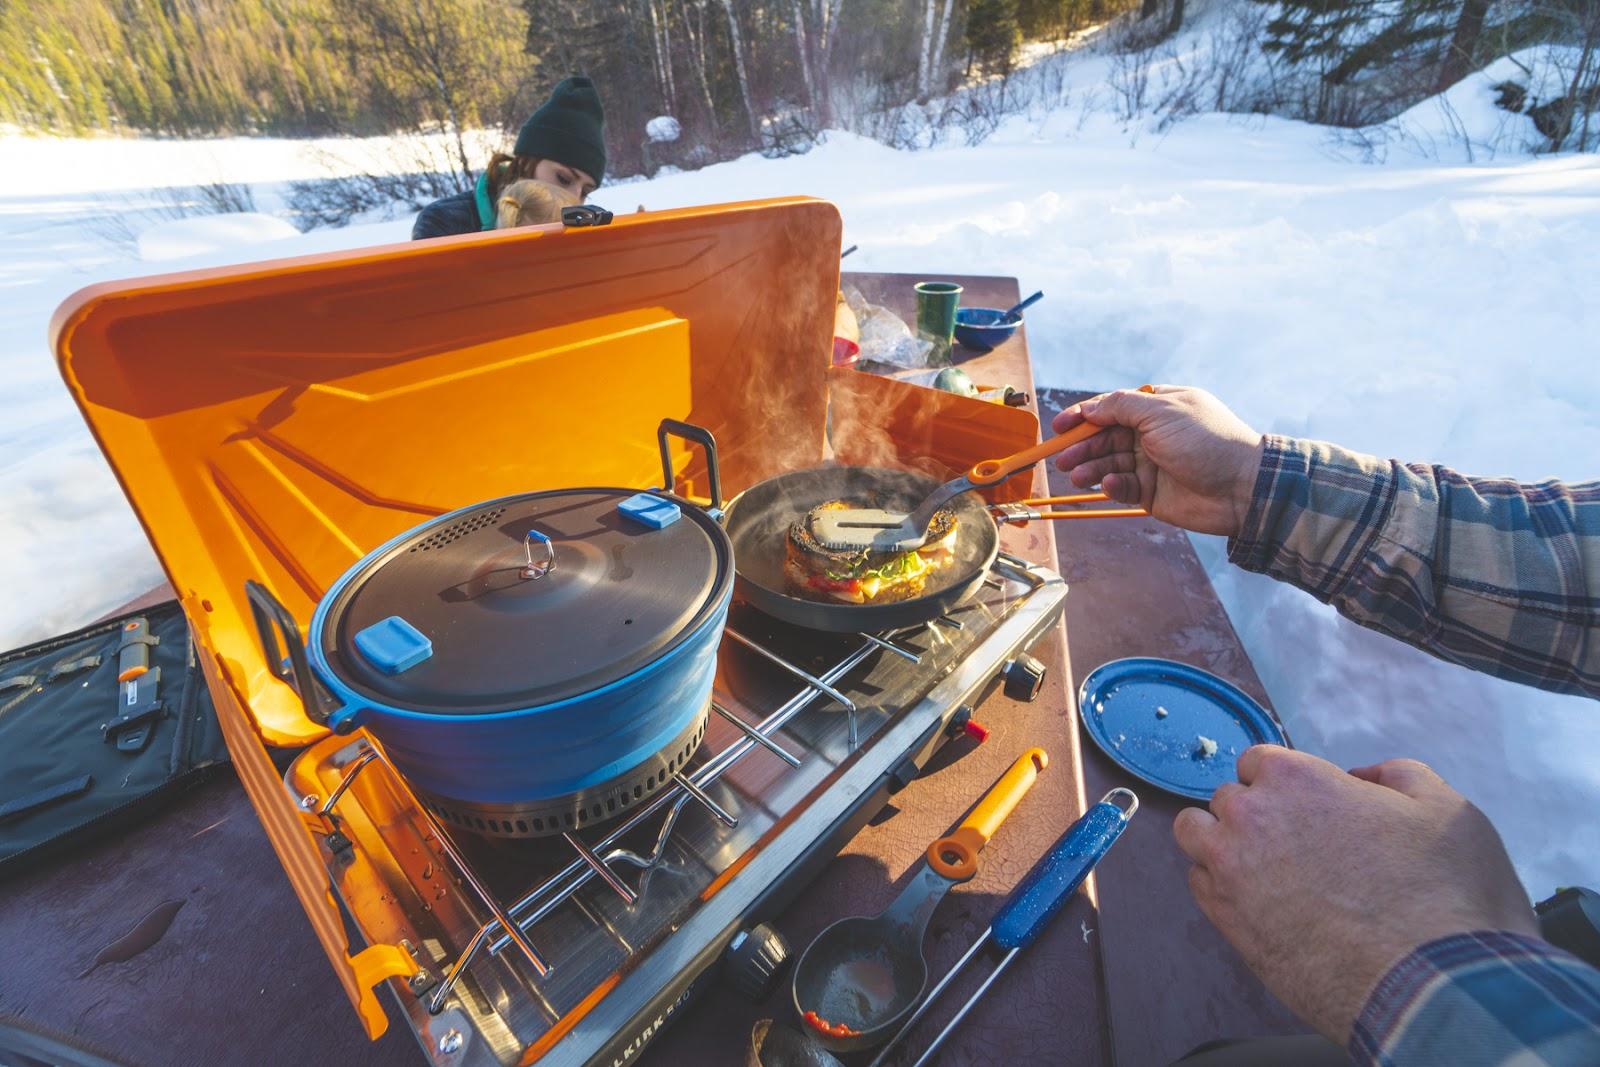 GSI Outdoors Glacier Camp Stove